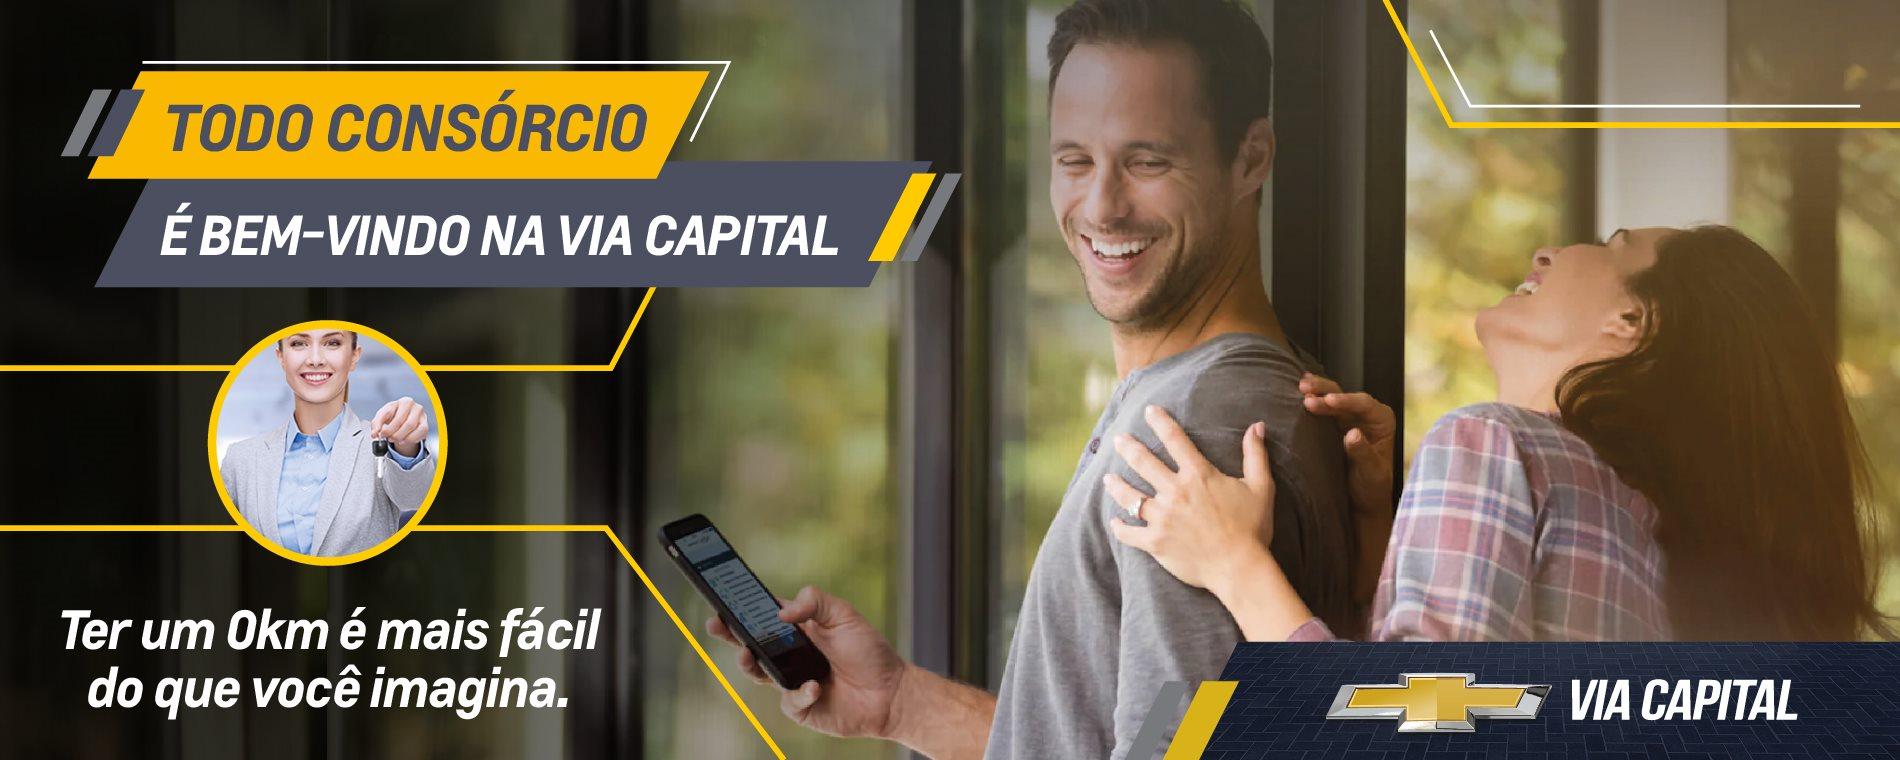 CONSORCIO CHEVROLET - 1900px